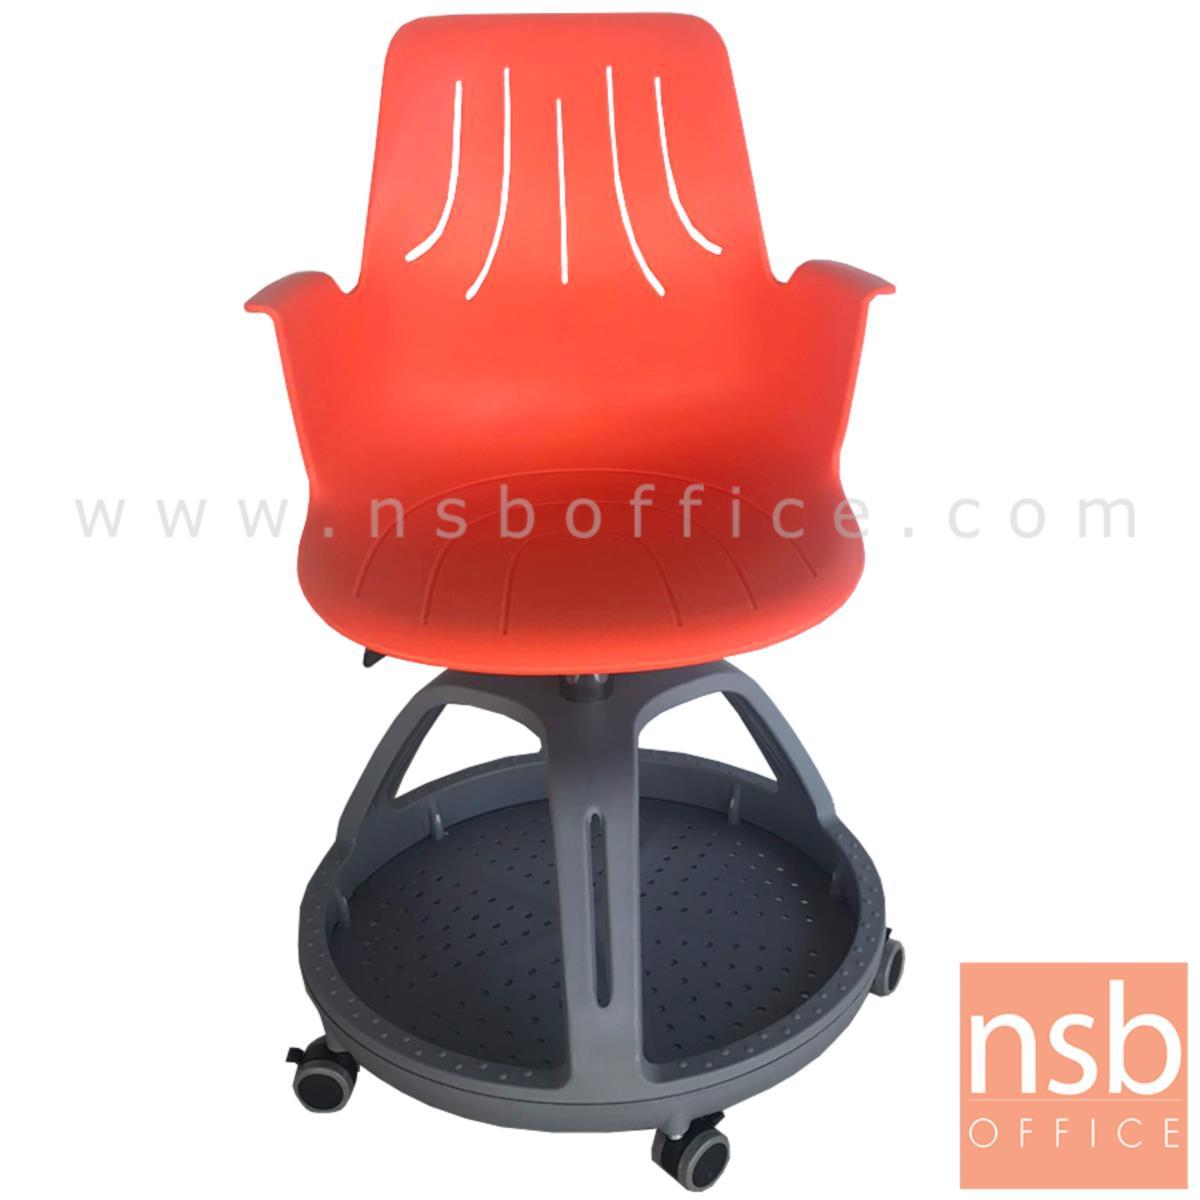 B30A045:เก้าอี้เฟรมโพลี่ล้อเลื่อน รุ่น Barnaby (บาร์นาบี้)  ไม่มีแผ่นเลคเชอร์ ฐานกลมวางกระเป๋าได้